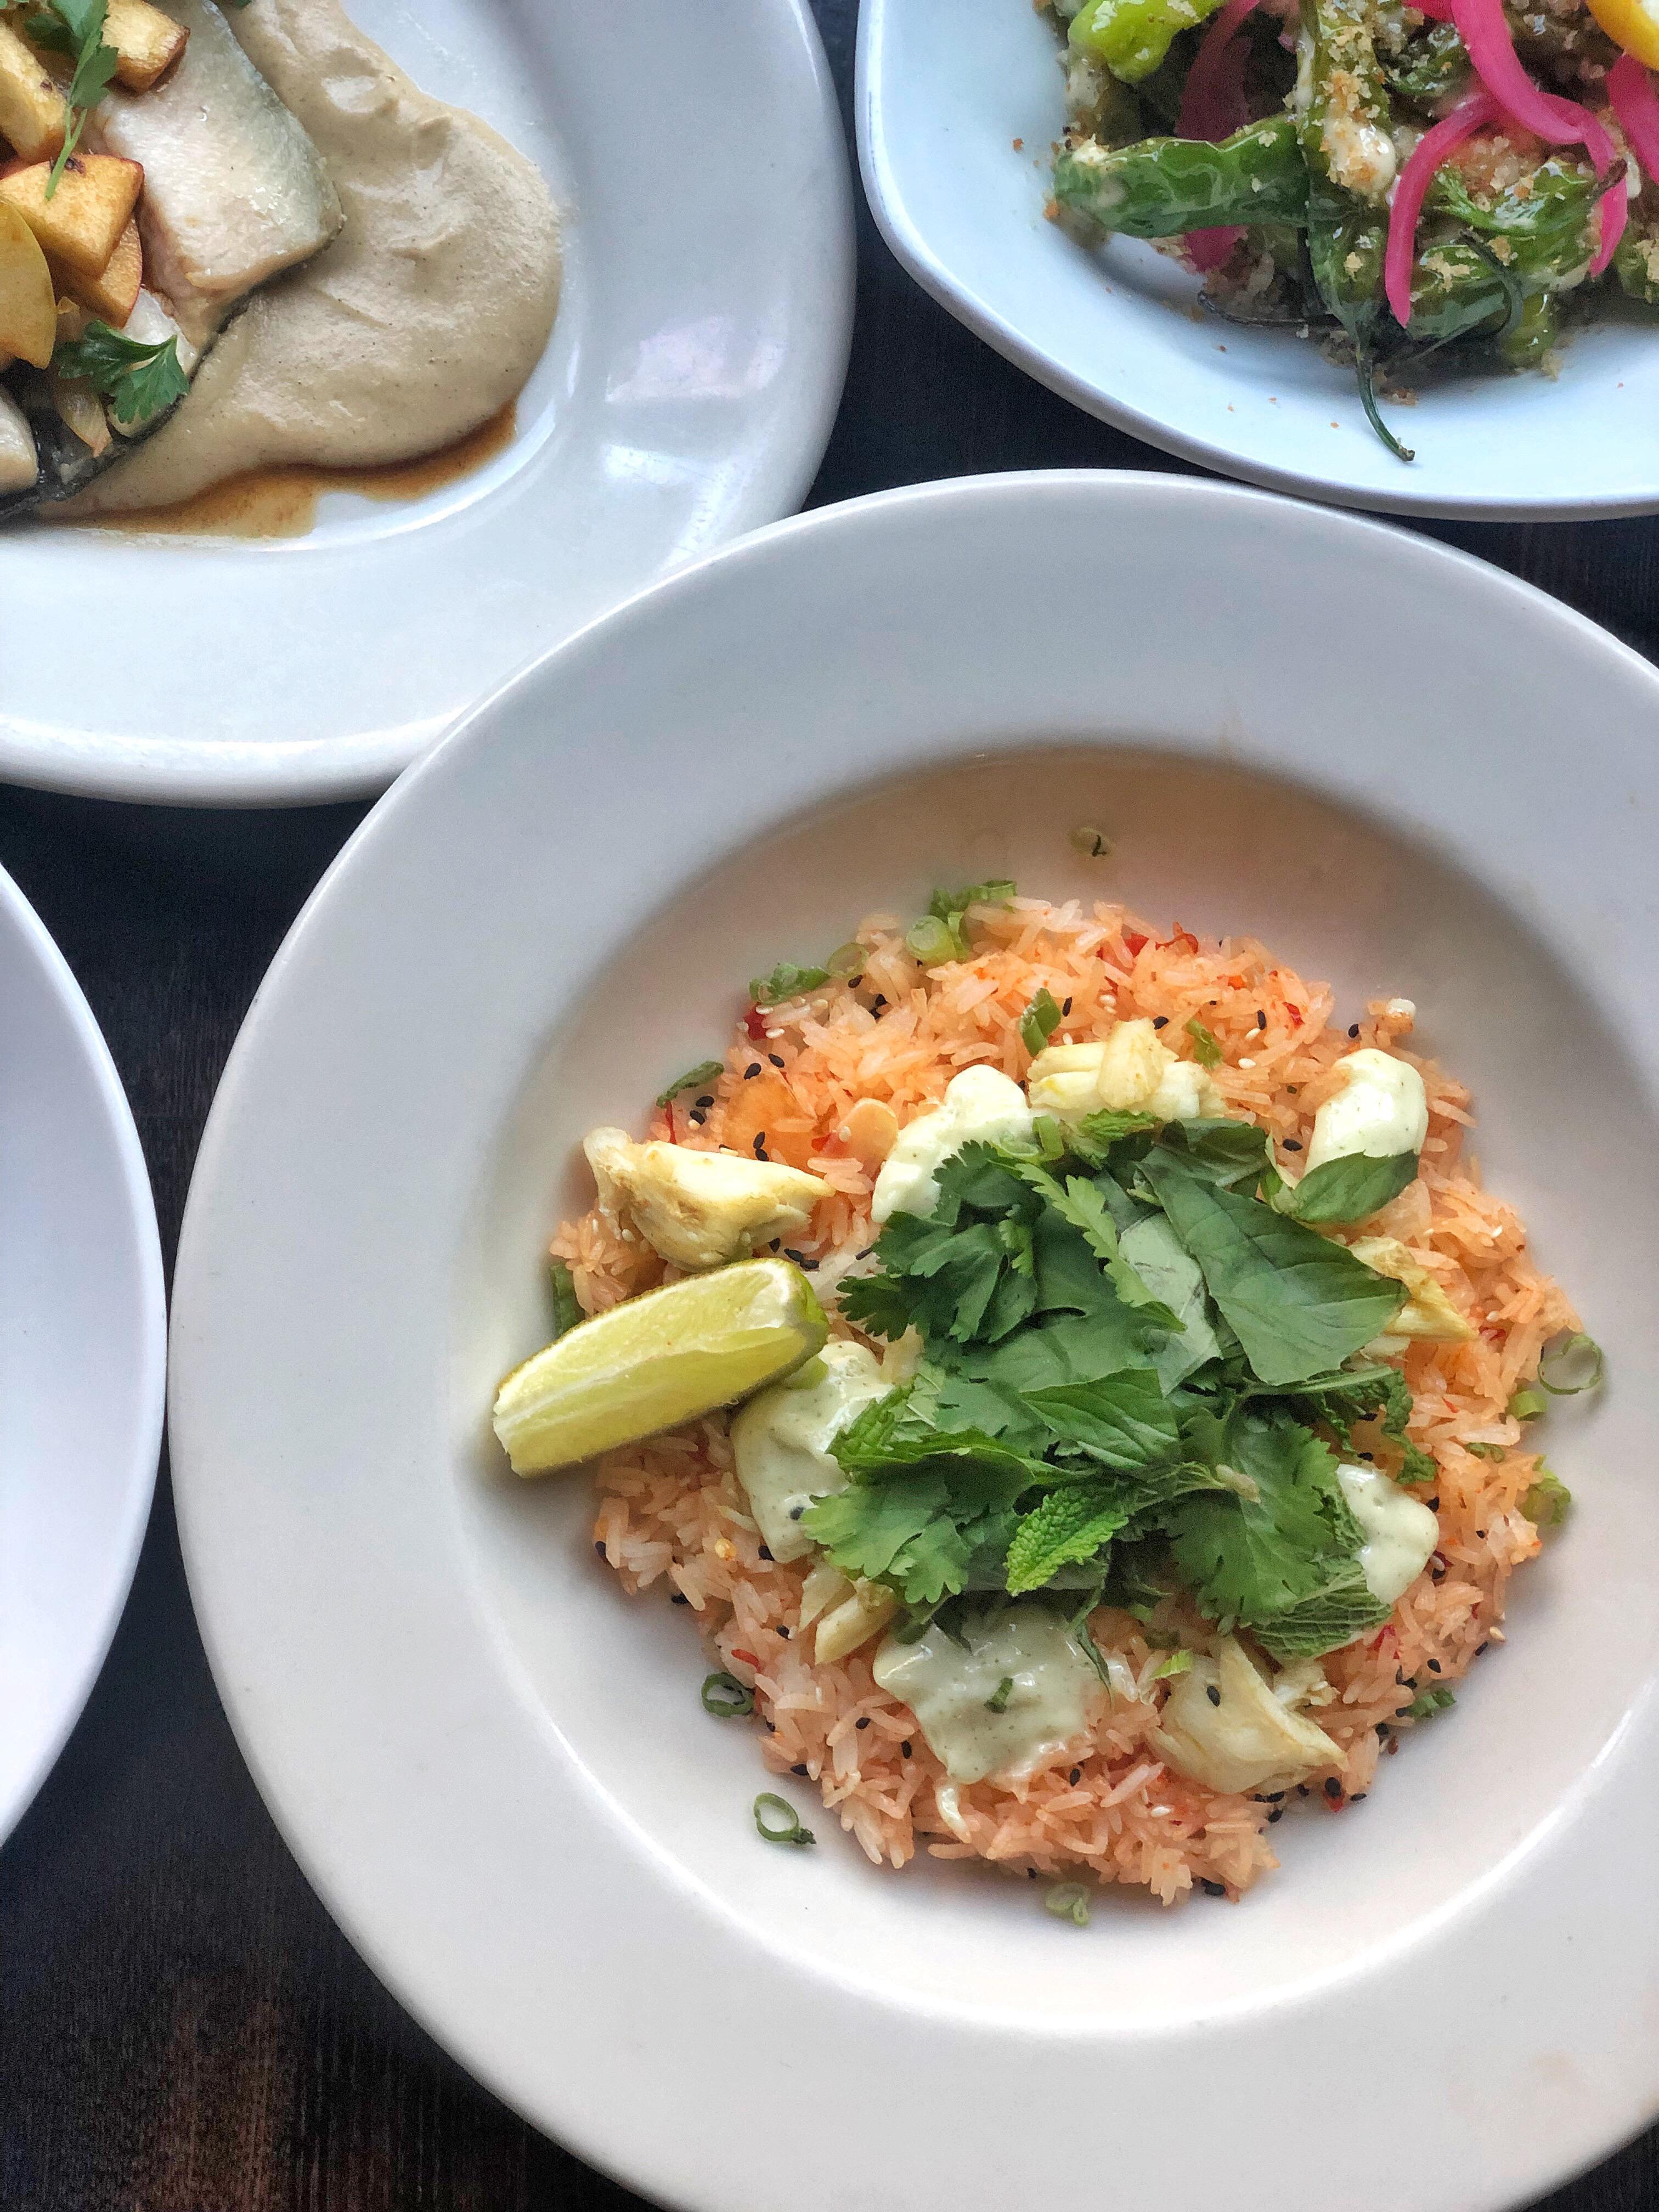 Blue Crab Chili Rice